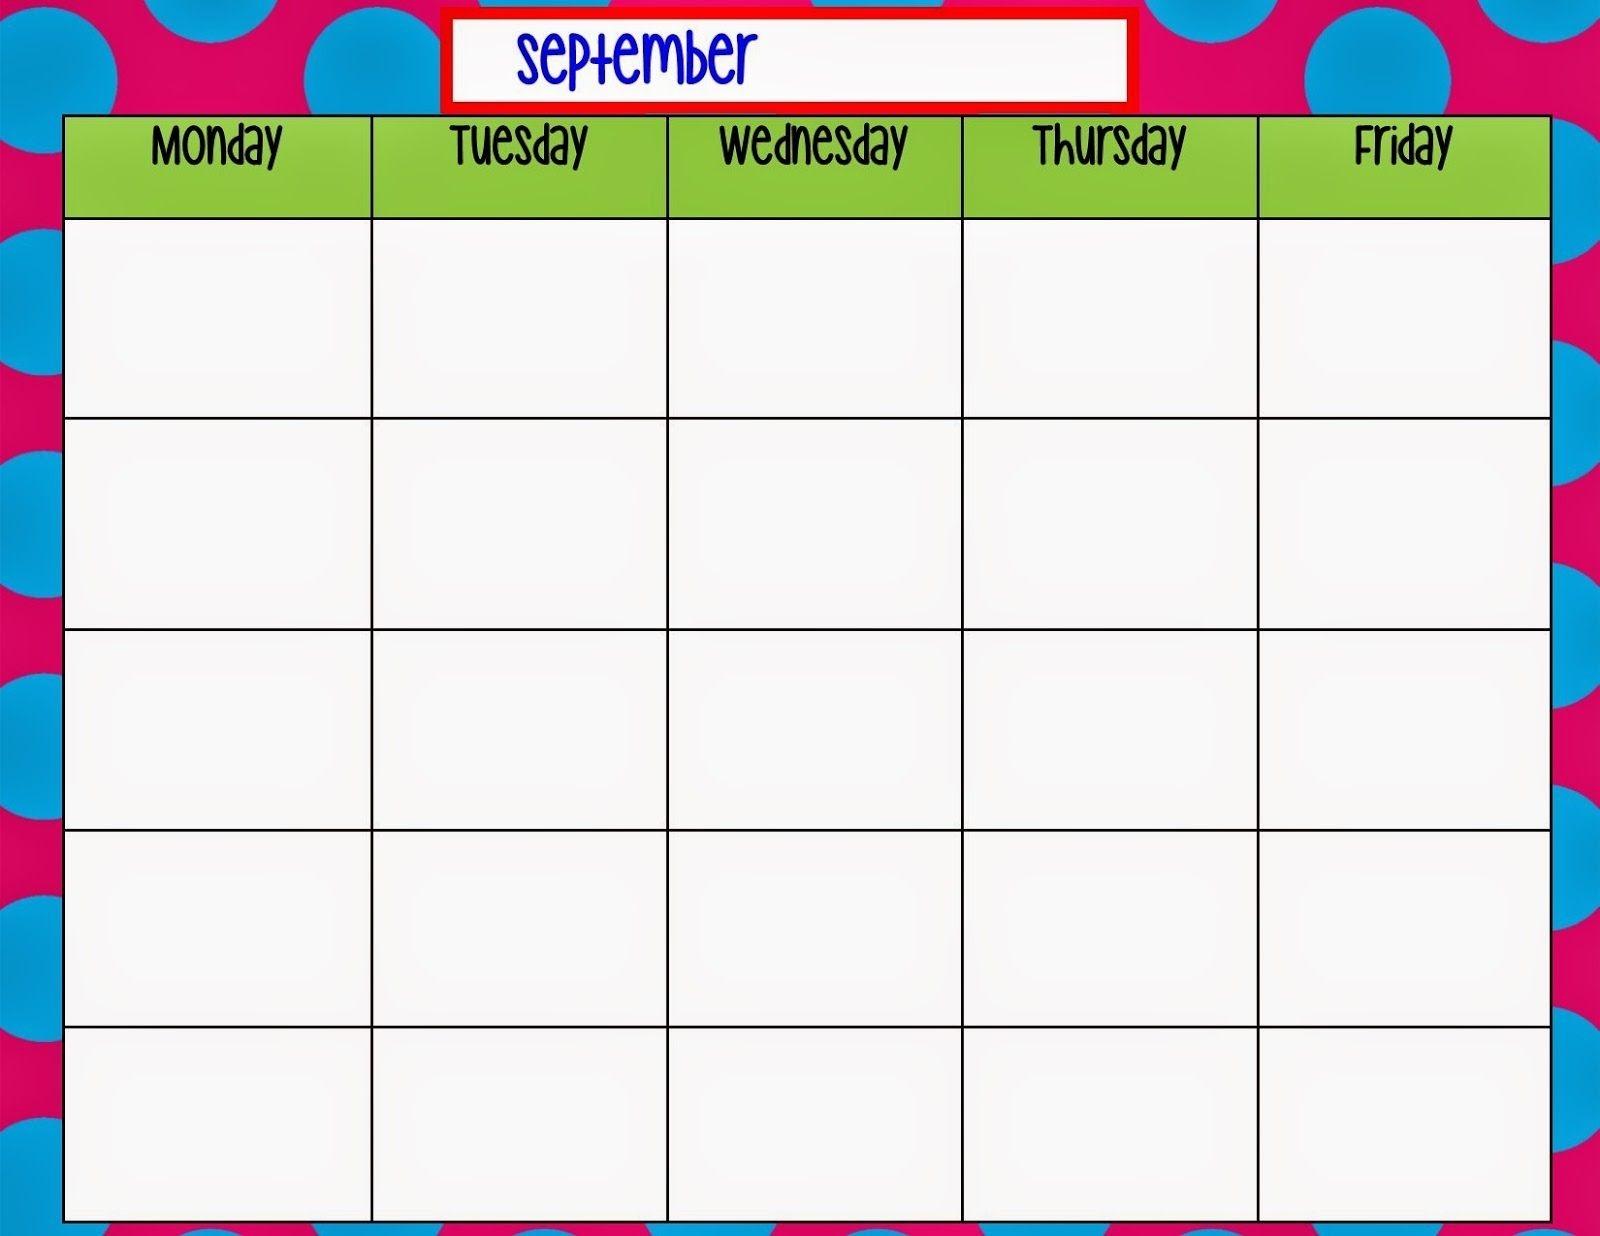 Monday Through Friday Calendar Template | Weekly Calendar-Free Printable Monday-Friday Monthly Calendar